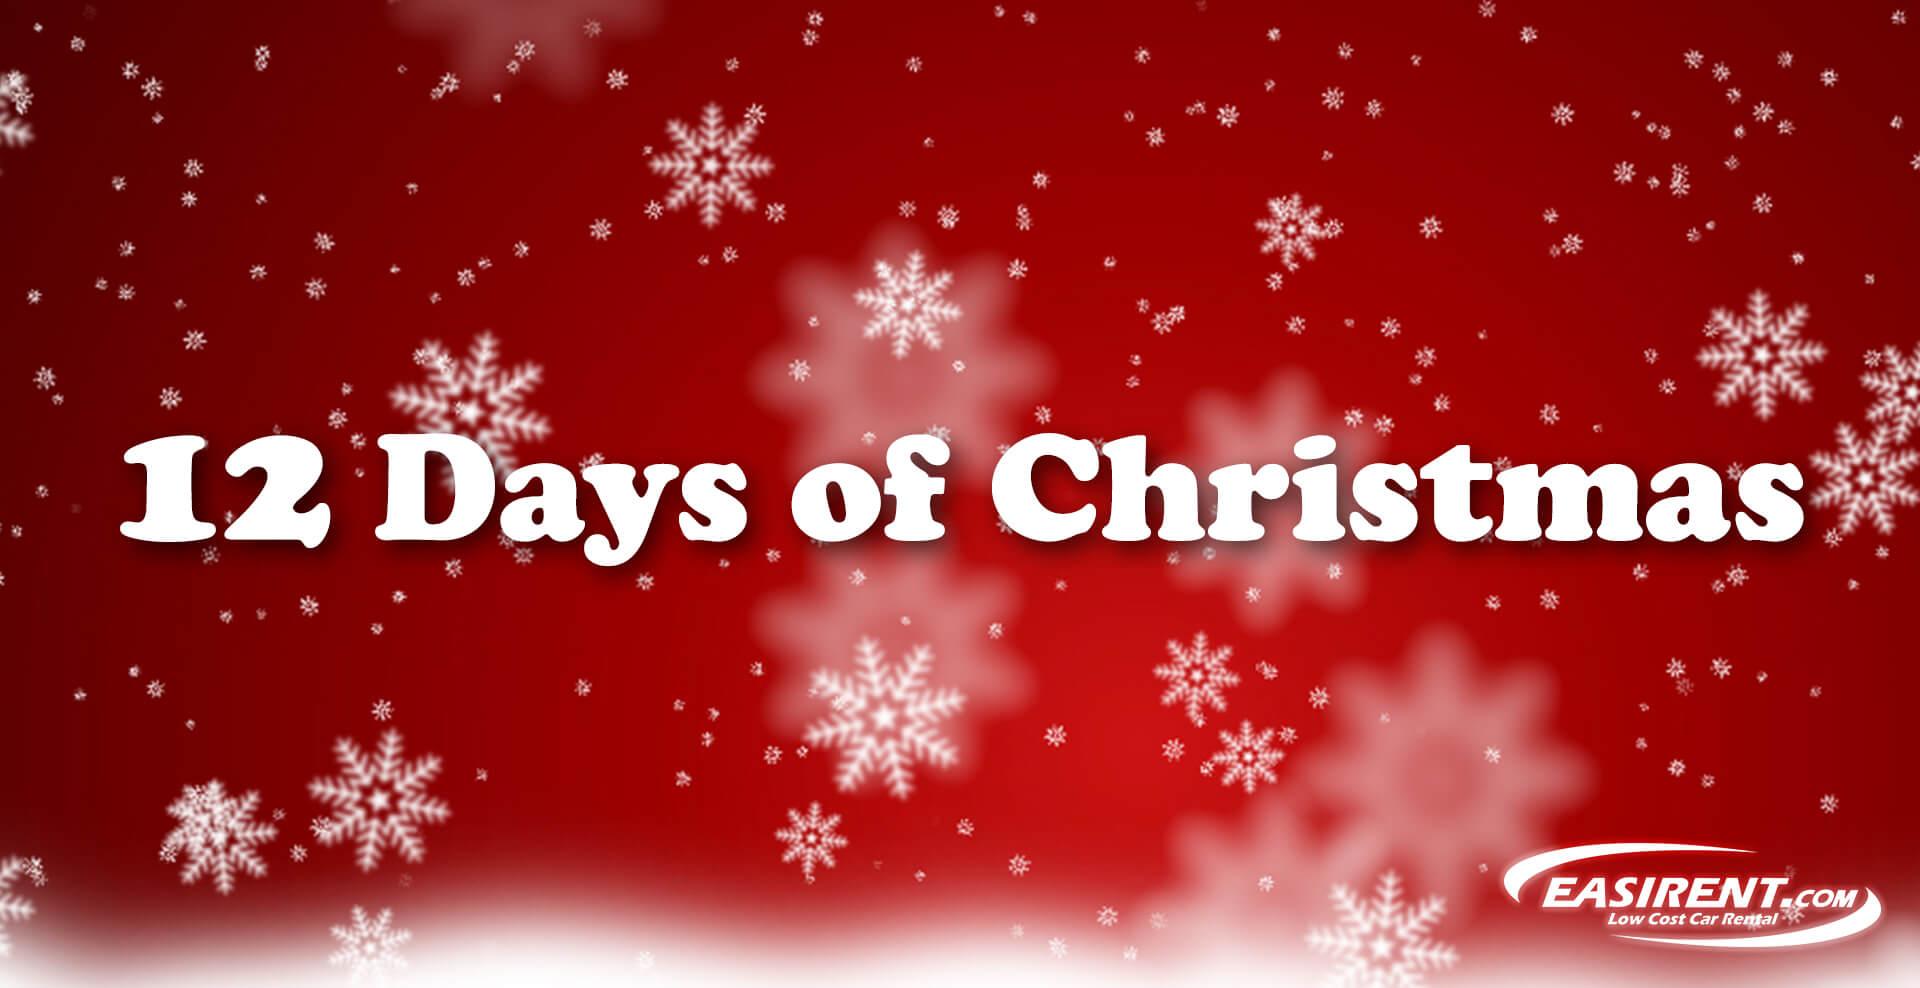 Christmas Deals.Easirent S 12 Days Of Christmas Deals Start Now Easirent